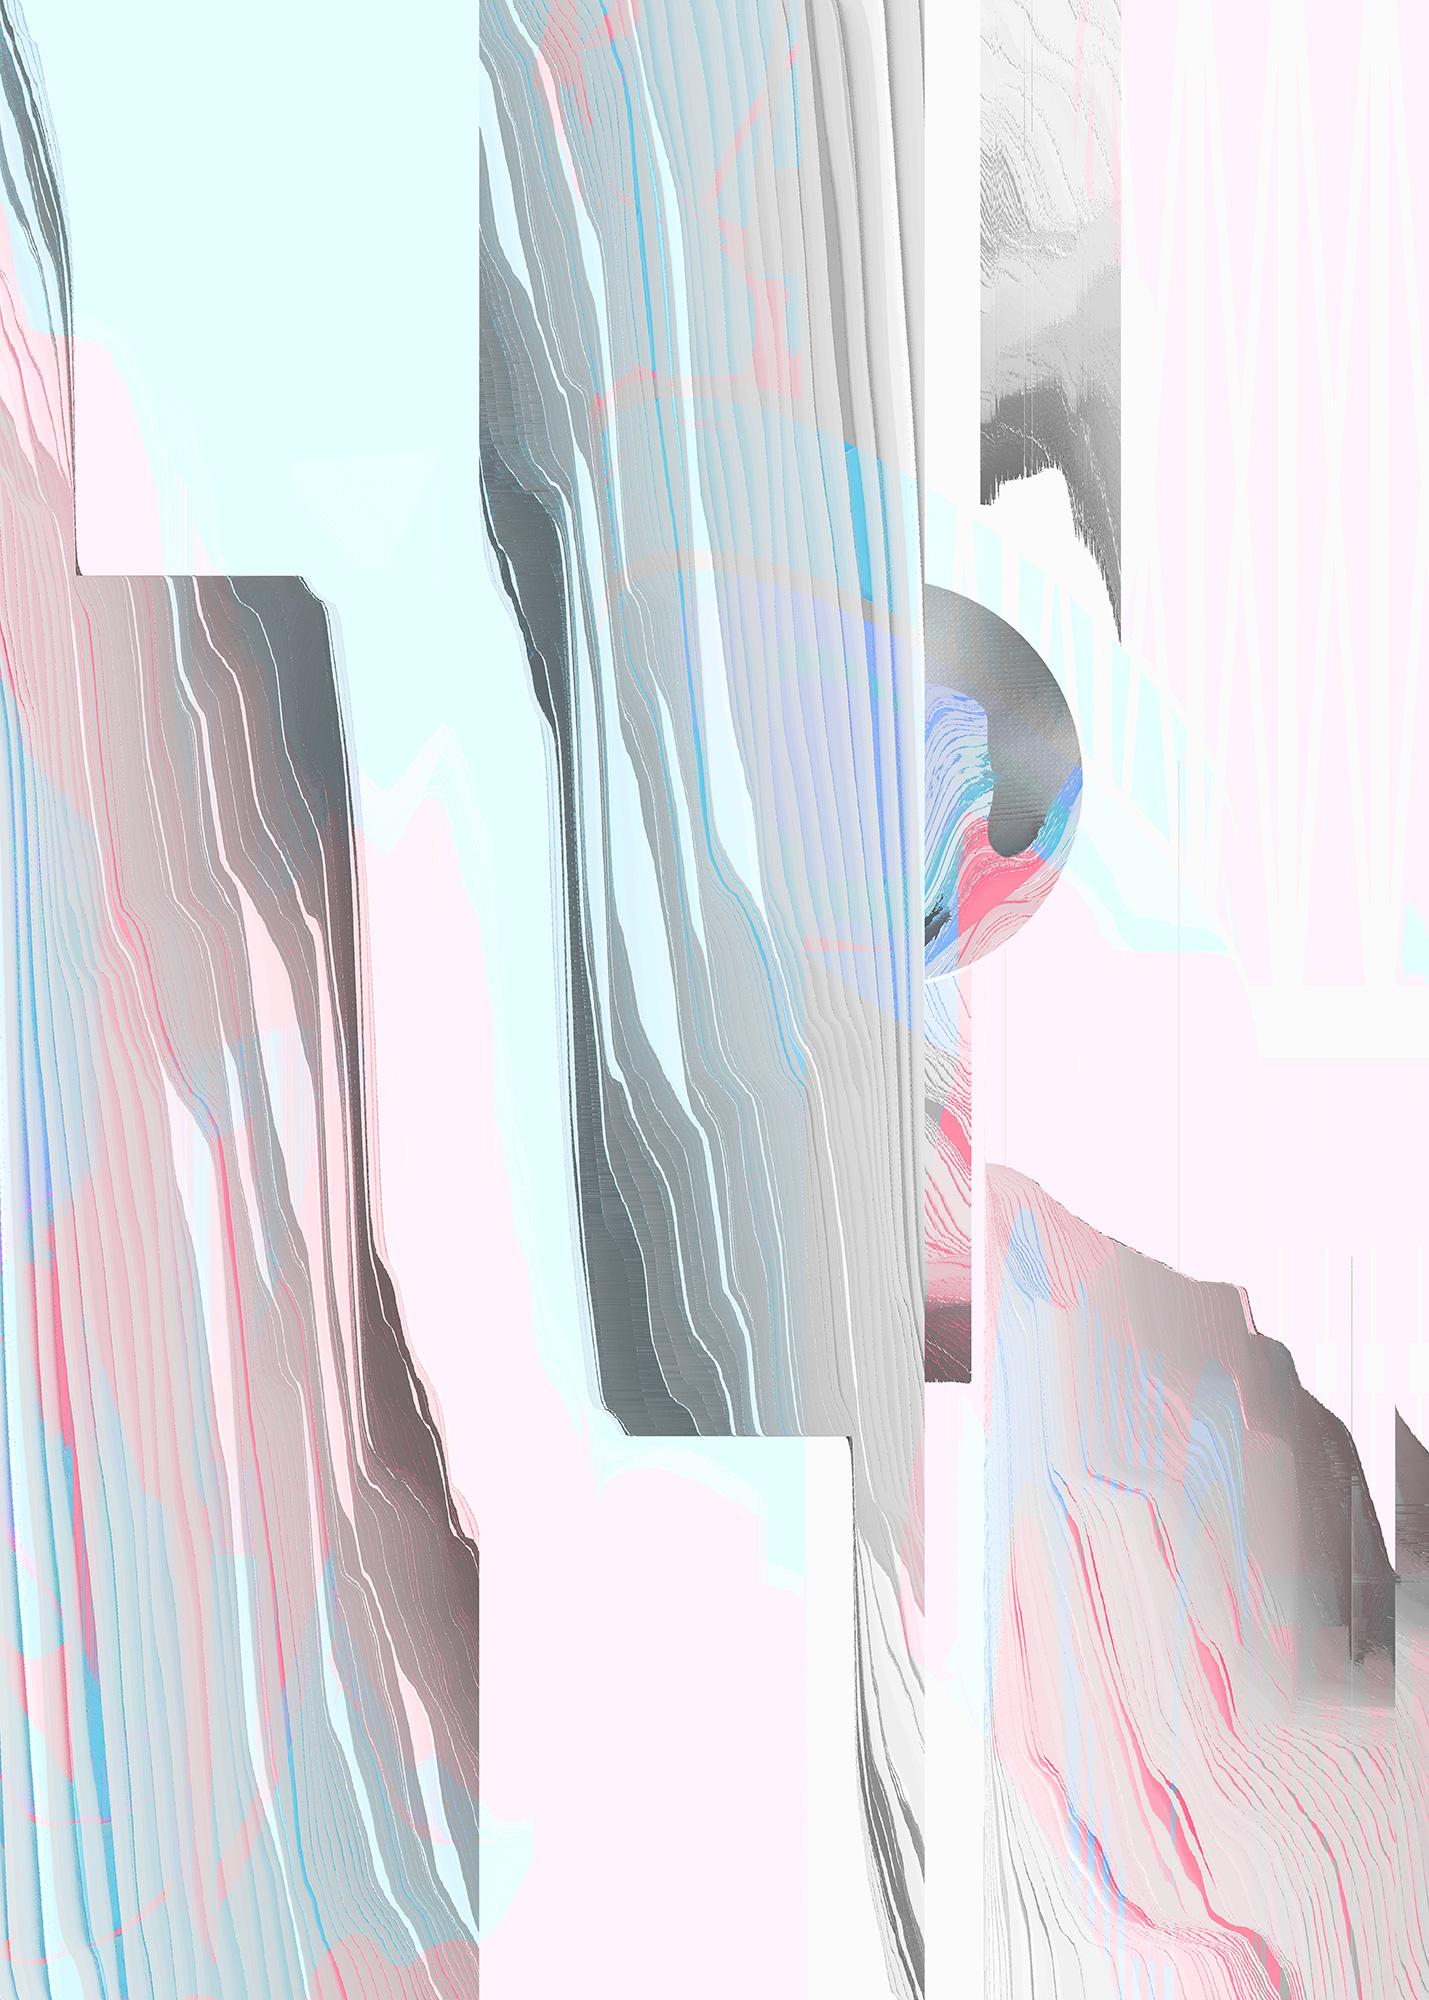 Ewa Doroszenko – Composition with the Sun online 11, obraz